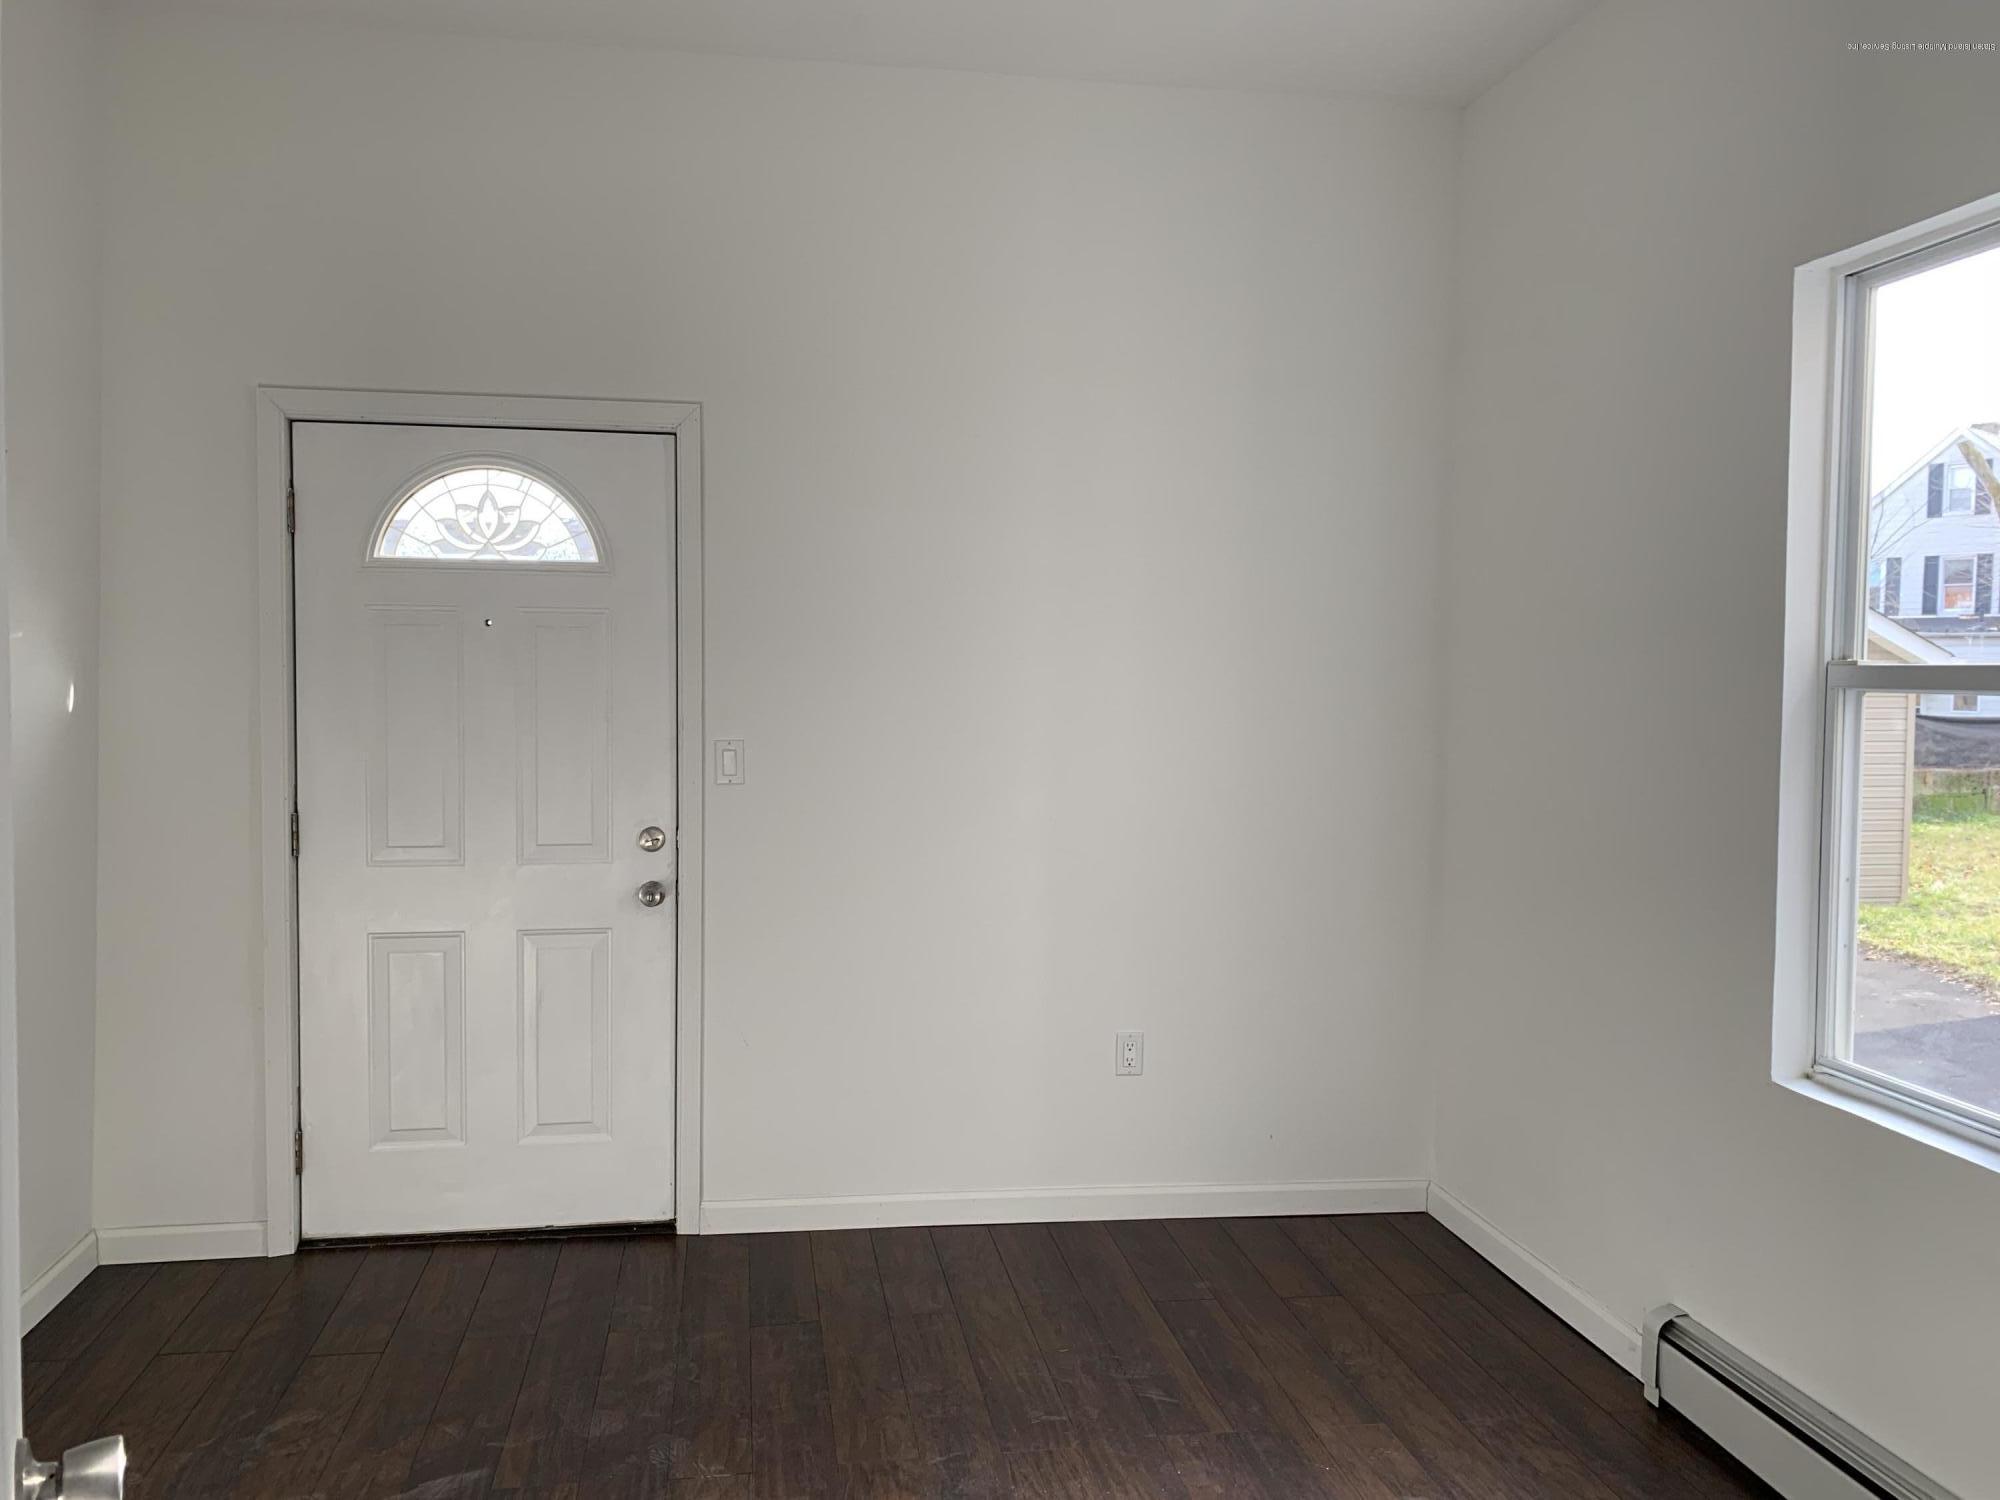 Two Family - Detached 69 Gordon Street  Staten Island, NY 10304, MLS-1124482-16